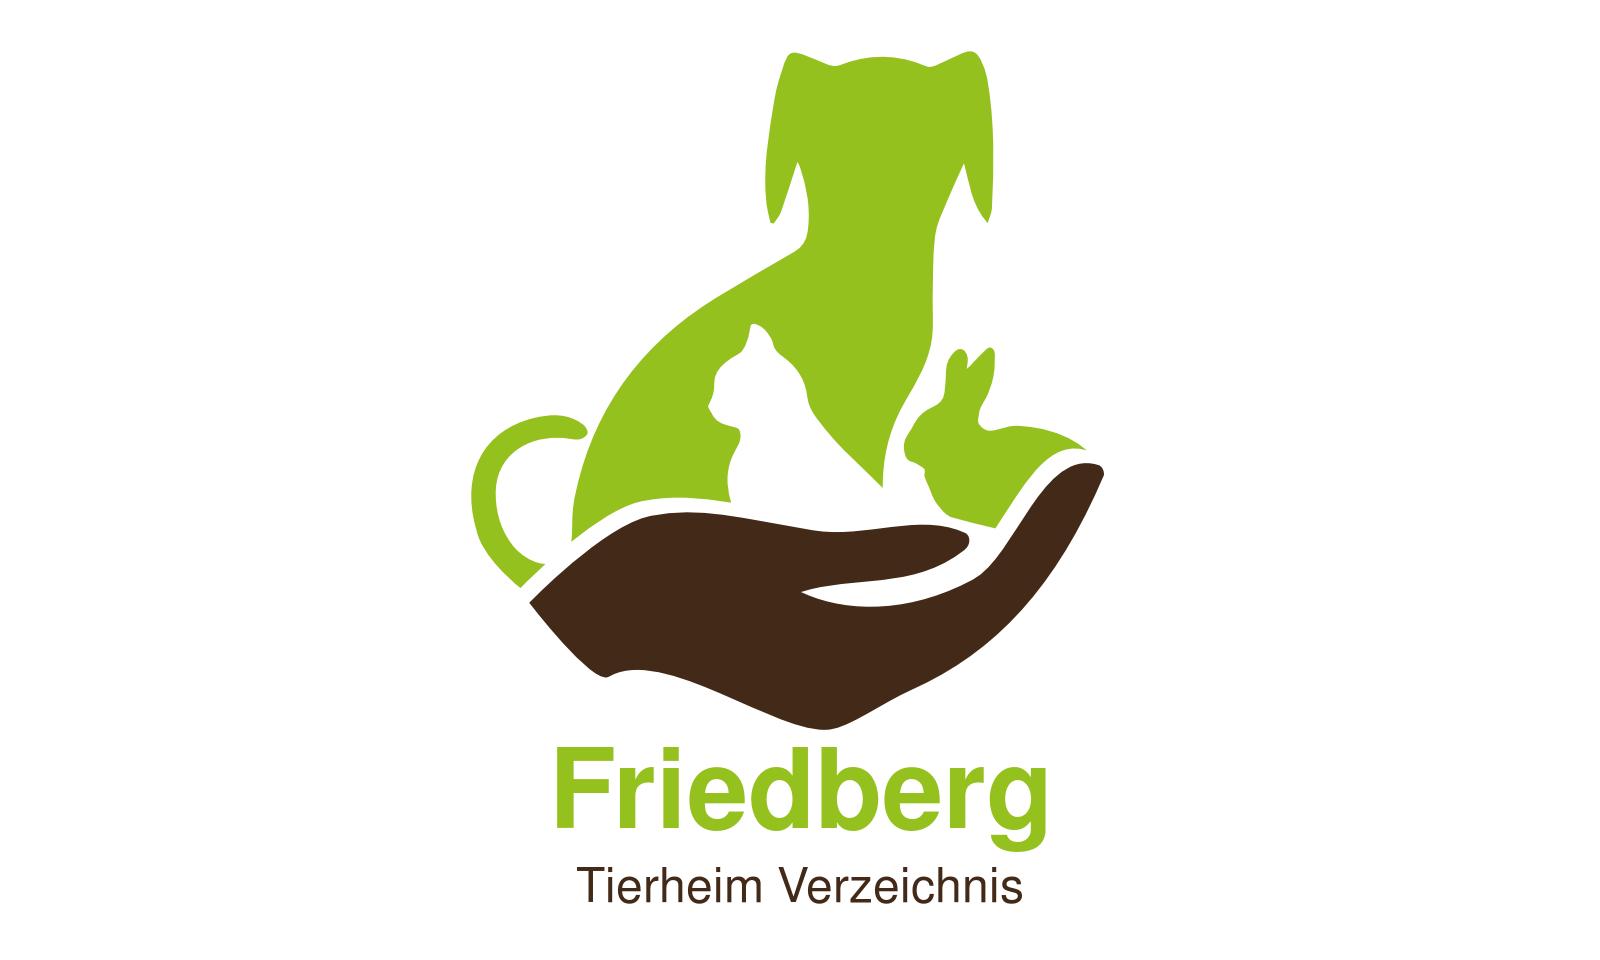 Tierheim Friedberg